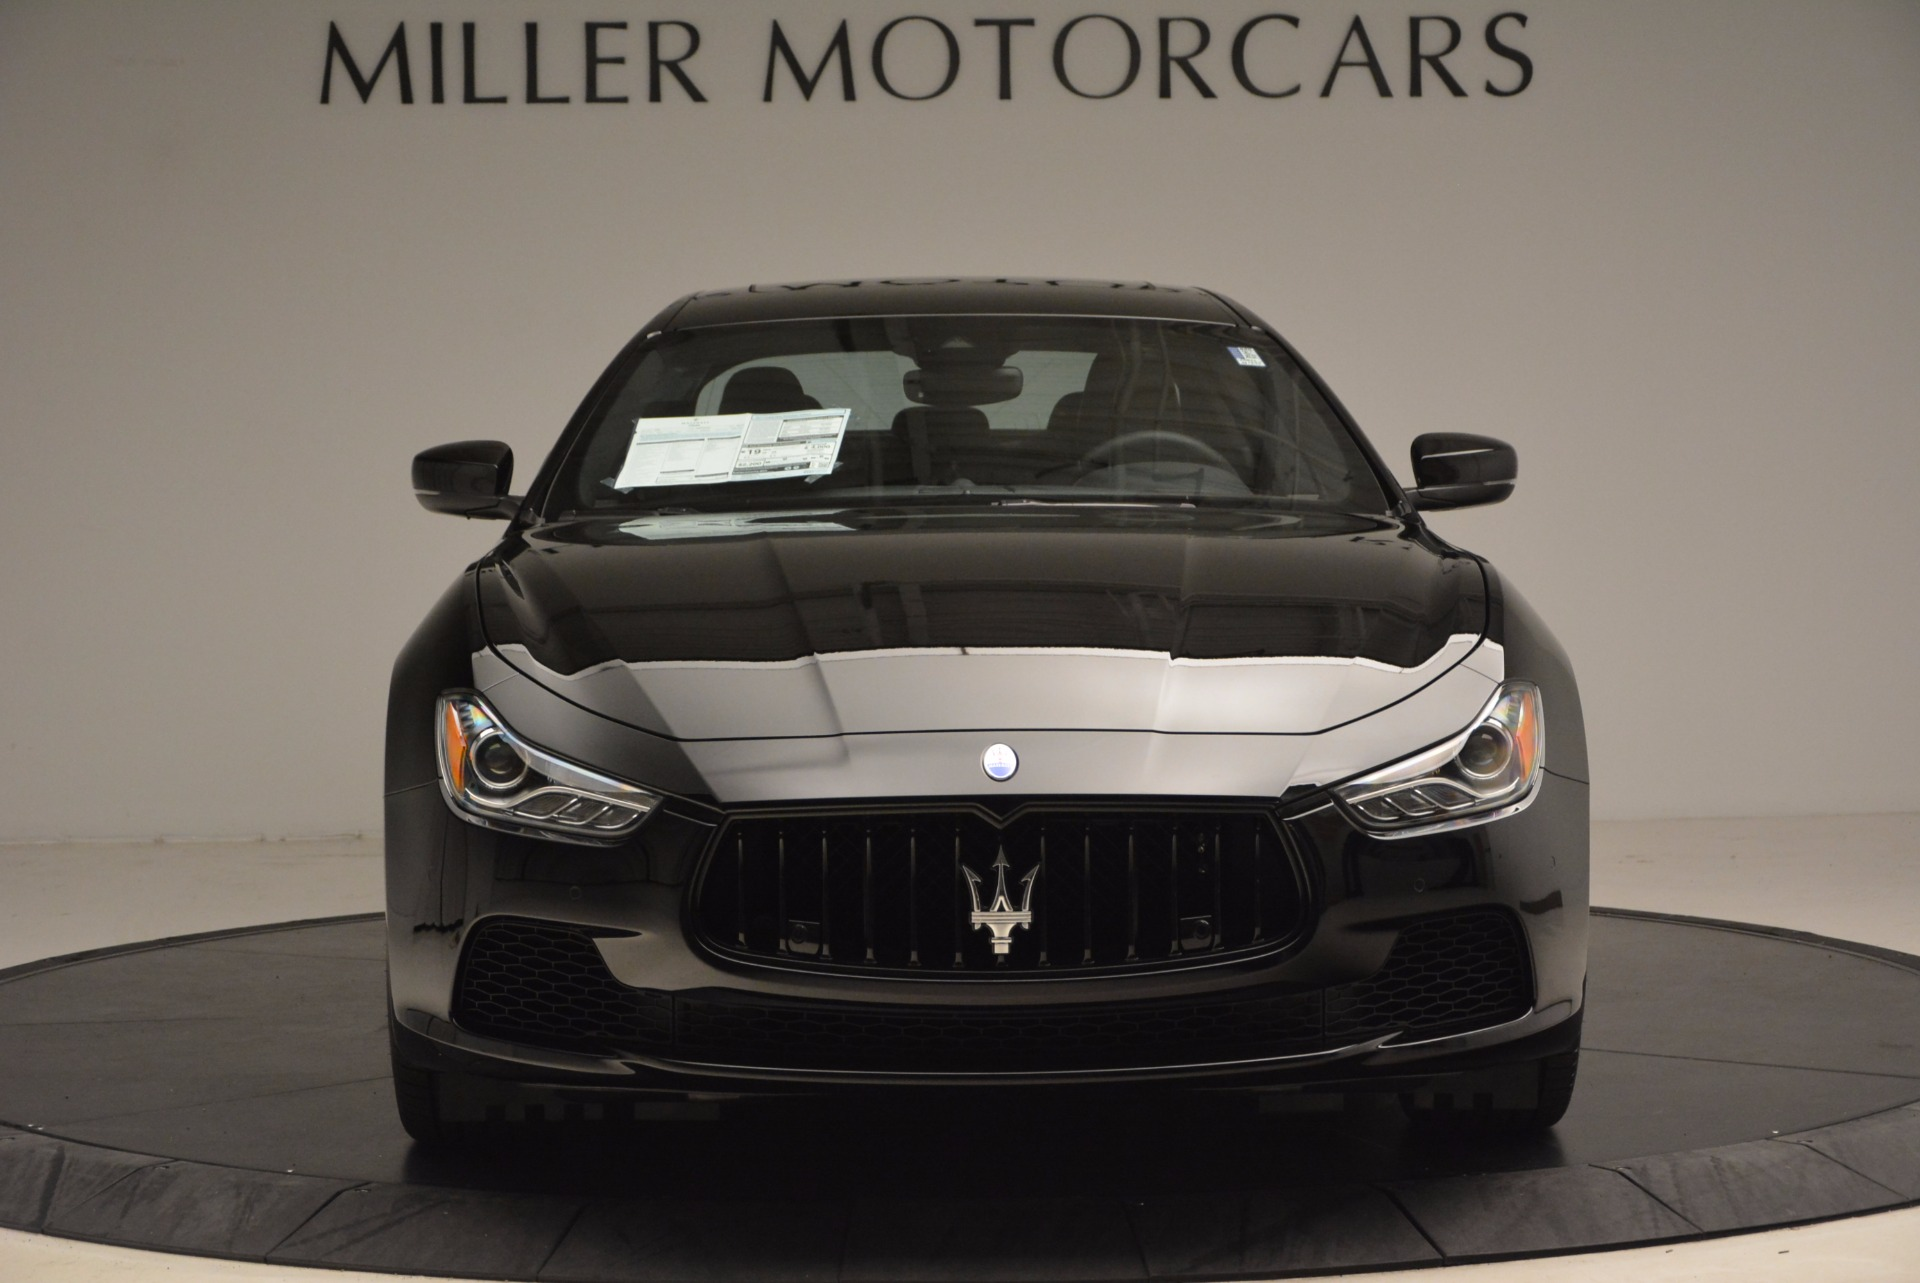 New 2017 Maserati Ghibli Nerissimo Edition S Q4 For Sale In Westport, CT 1420_p12